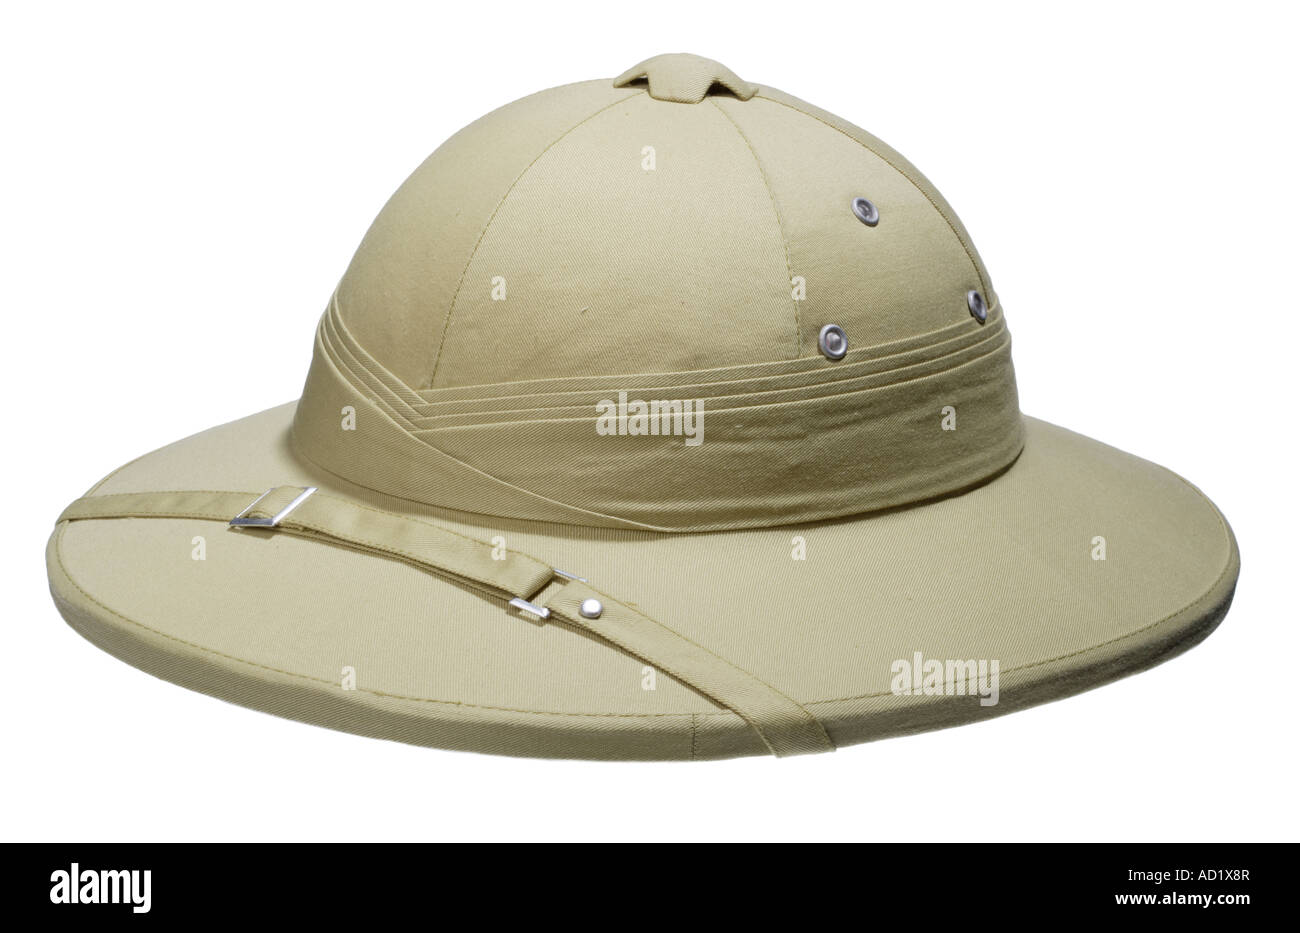 a5126f452d85f Pith Helmet Stock Photos   Pith Helmet Stock Images - Alamy